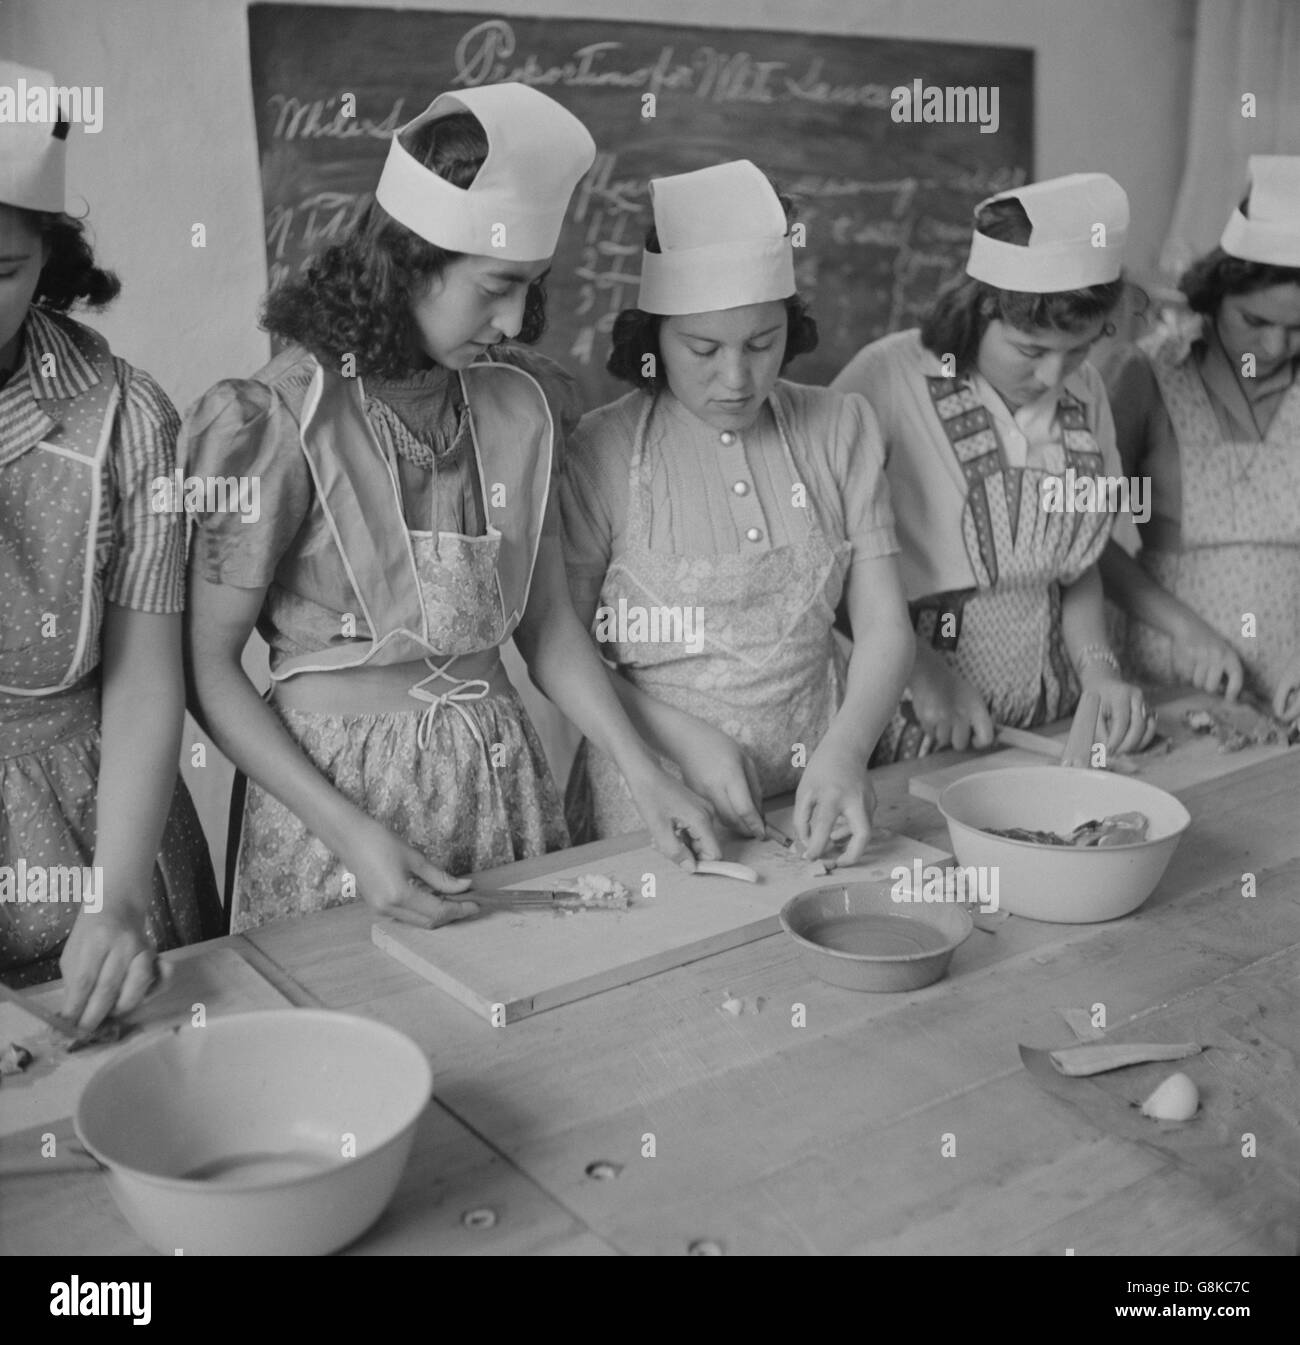 New mexico taos county penasco - Teenage High School Girls In Domestic Science Class Penasco New Mexico Usa